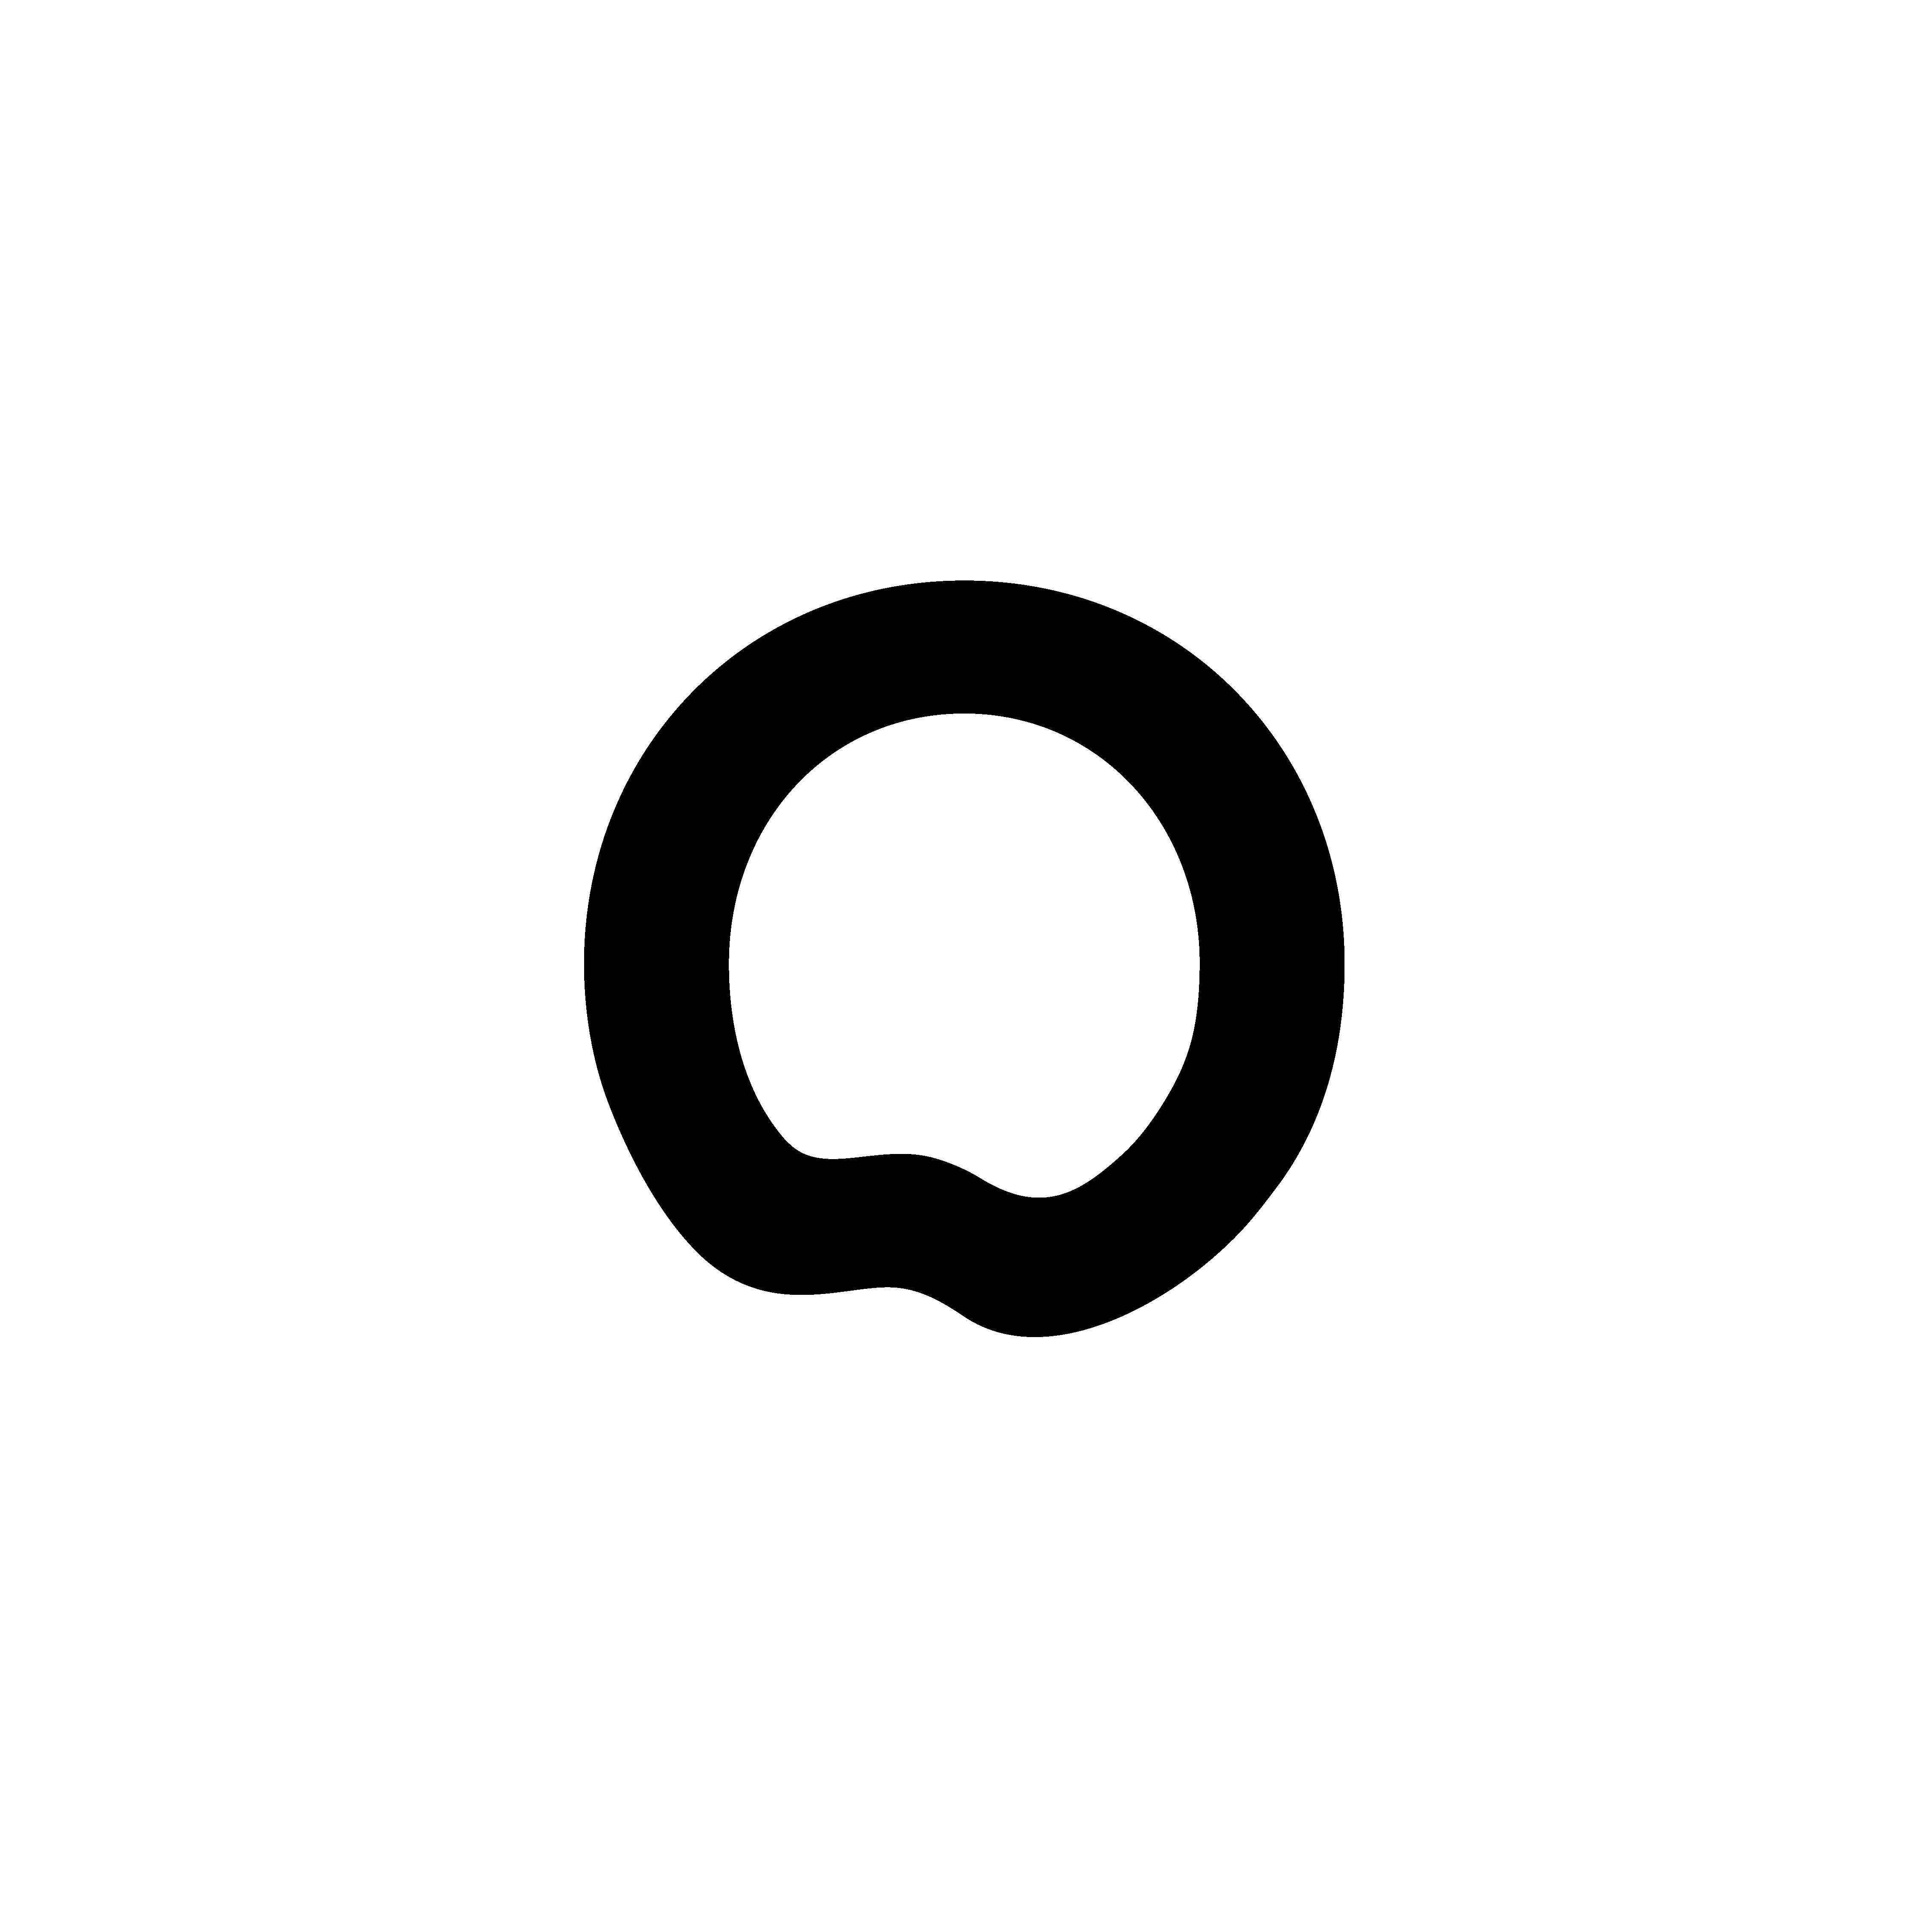 Bildmarke der tomoorow Initiative